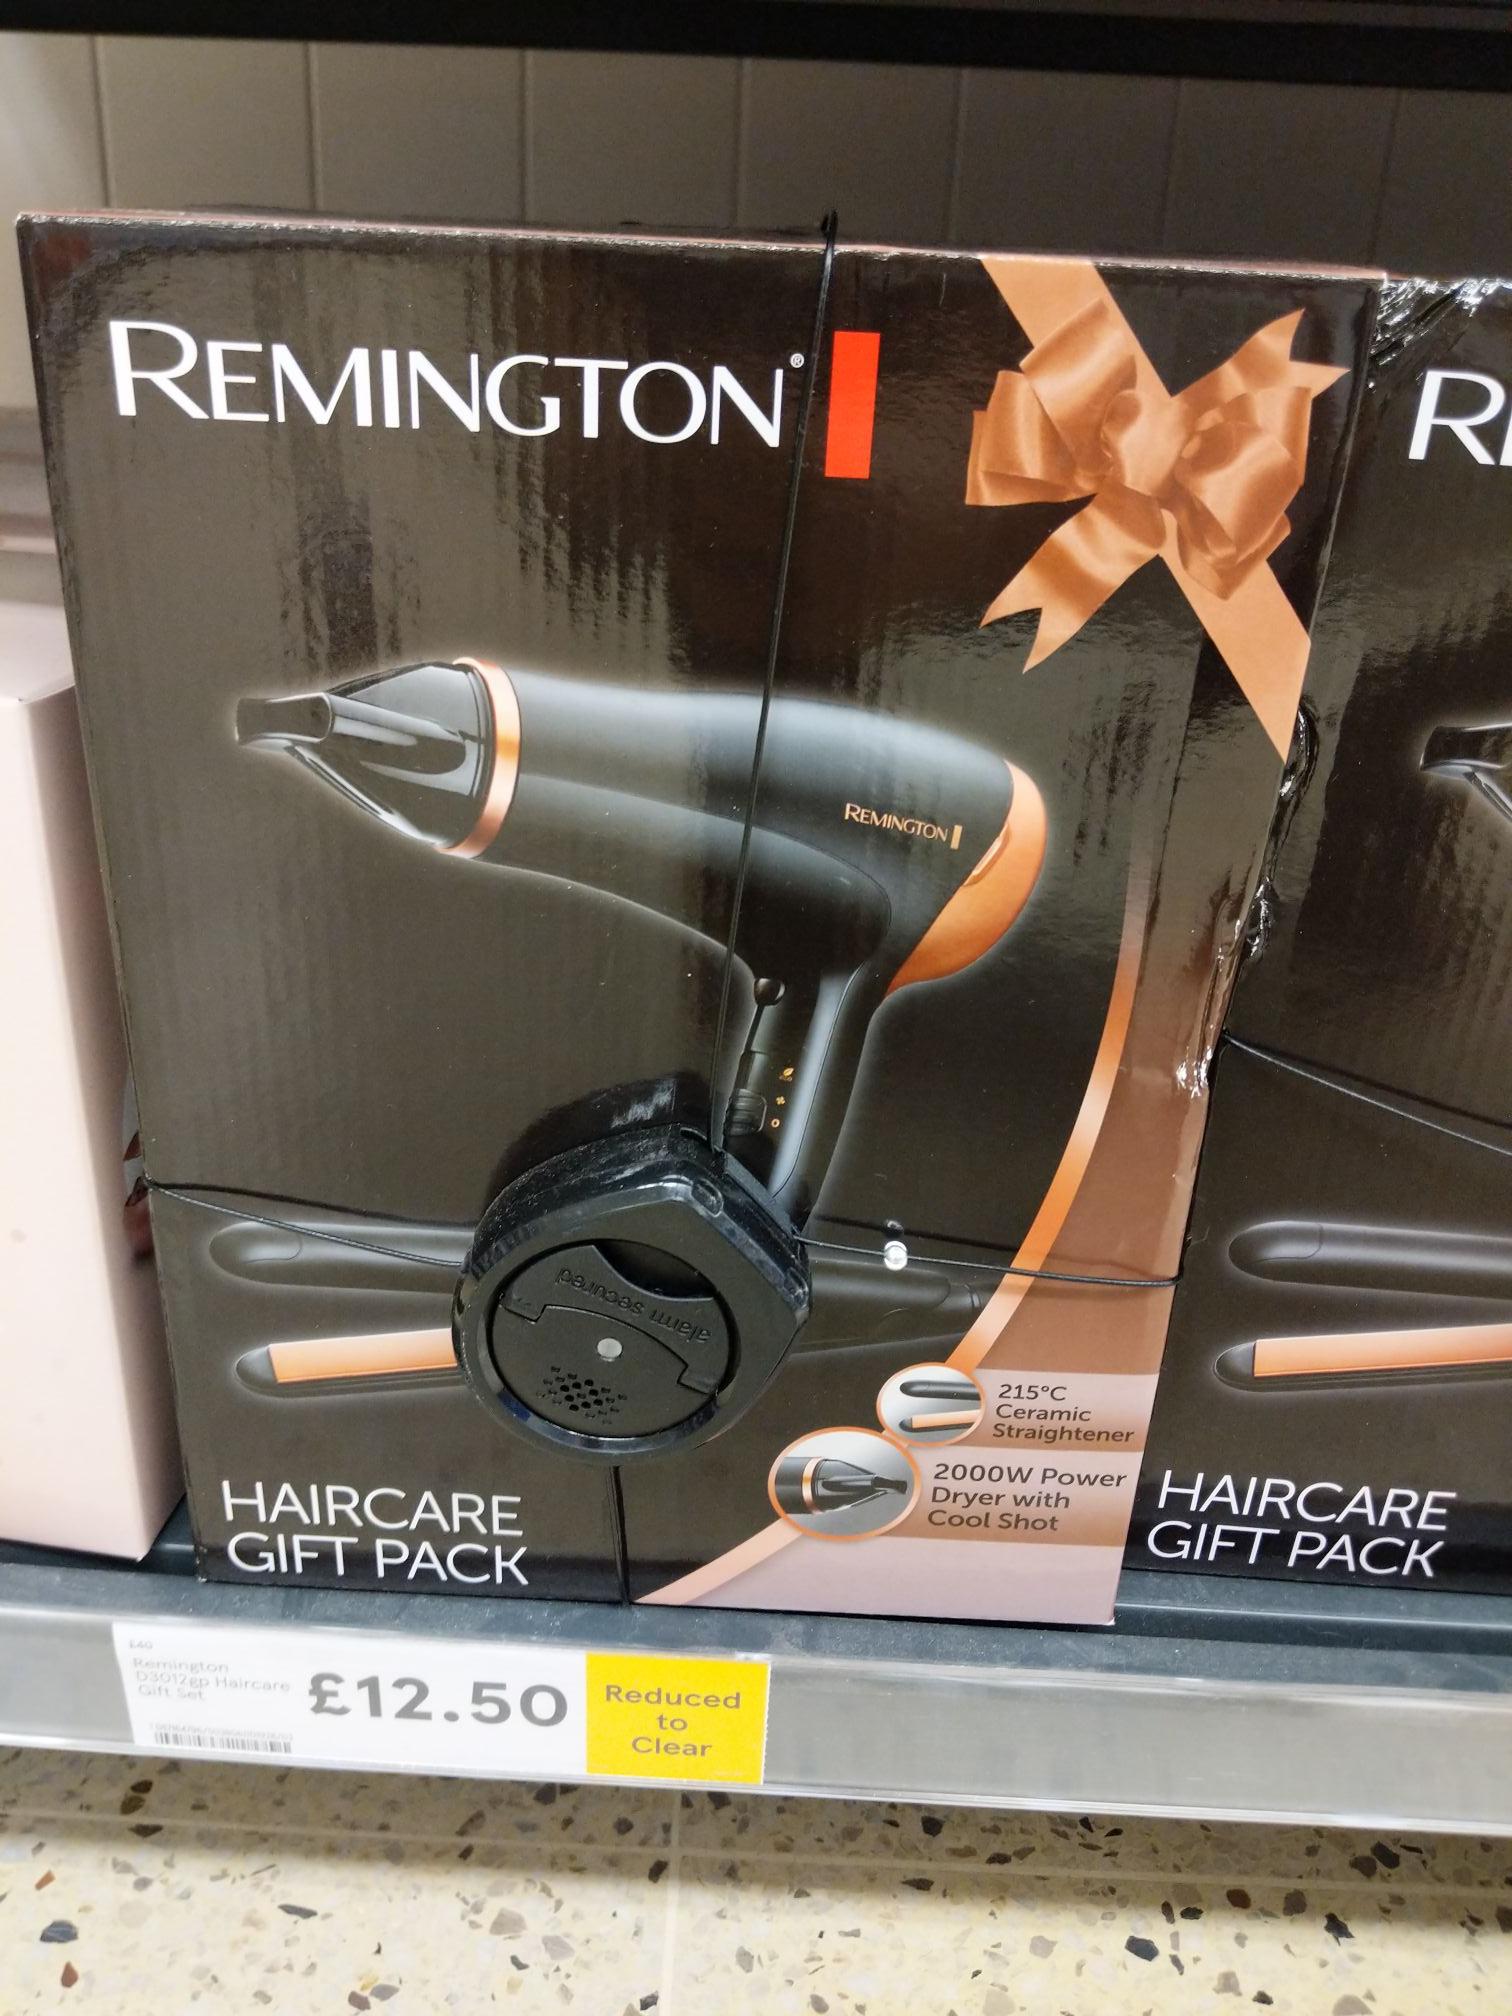 Tesco Remington Hair Care Gift pack - hairdryer and straighteners (Barnstaple Store)